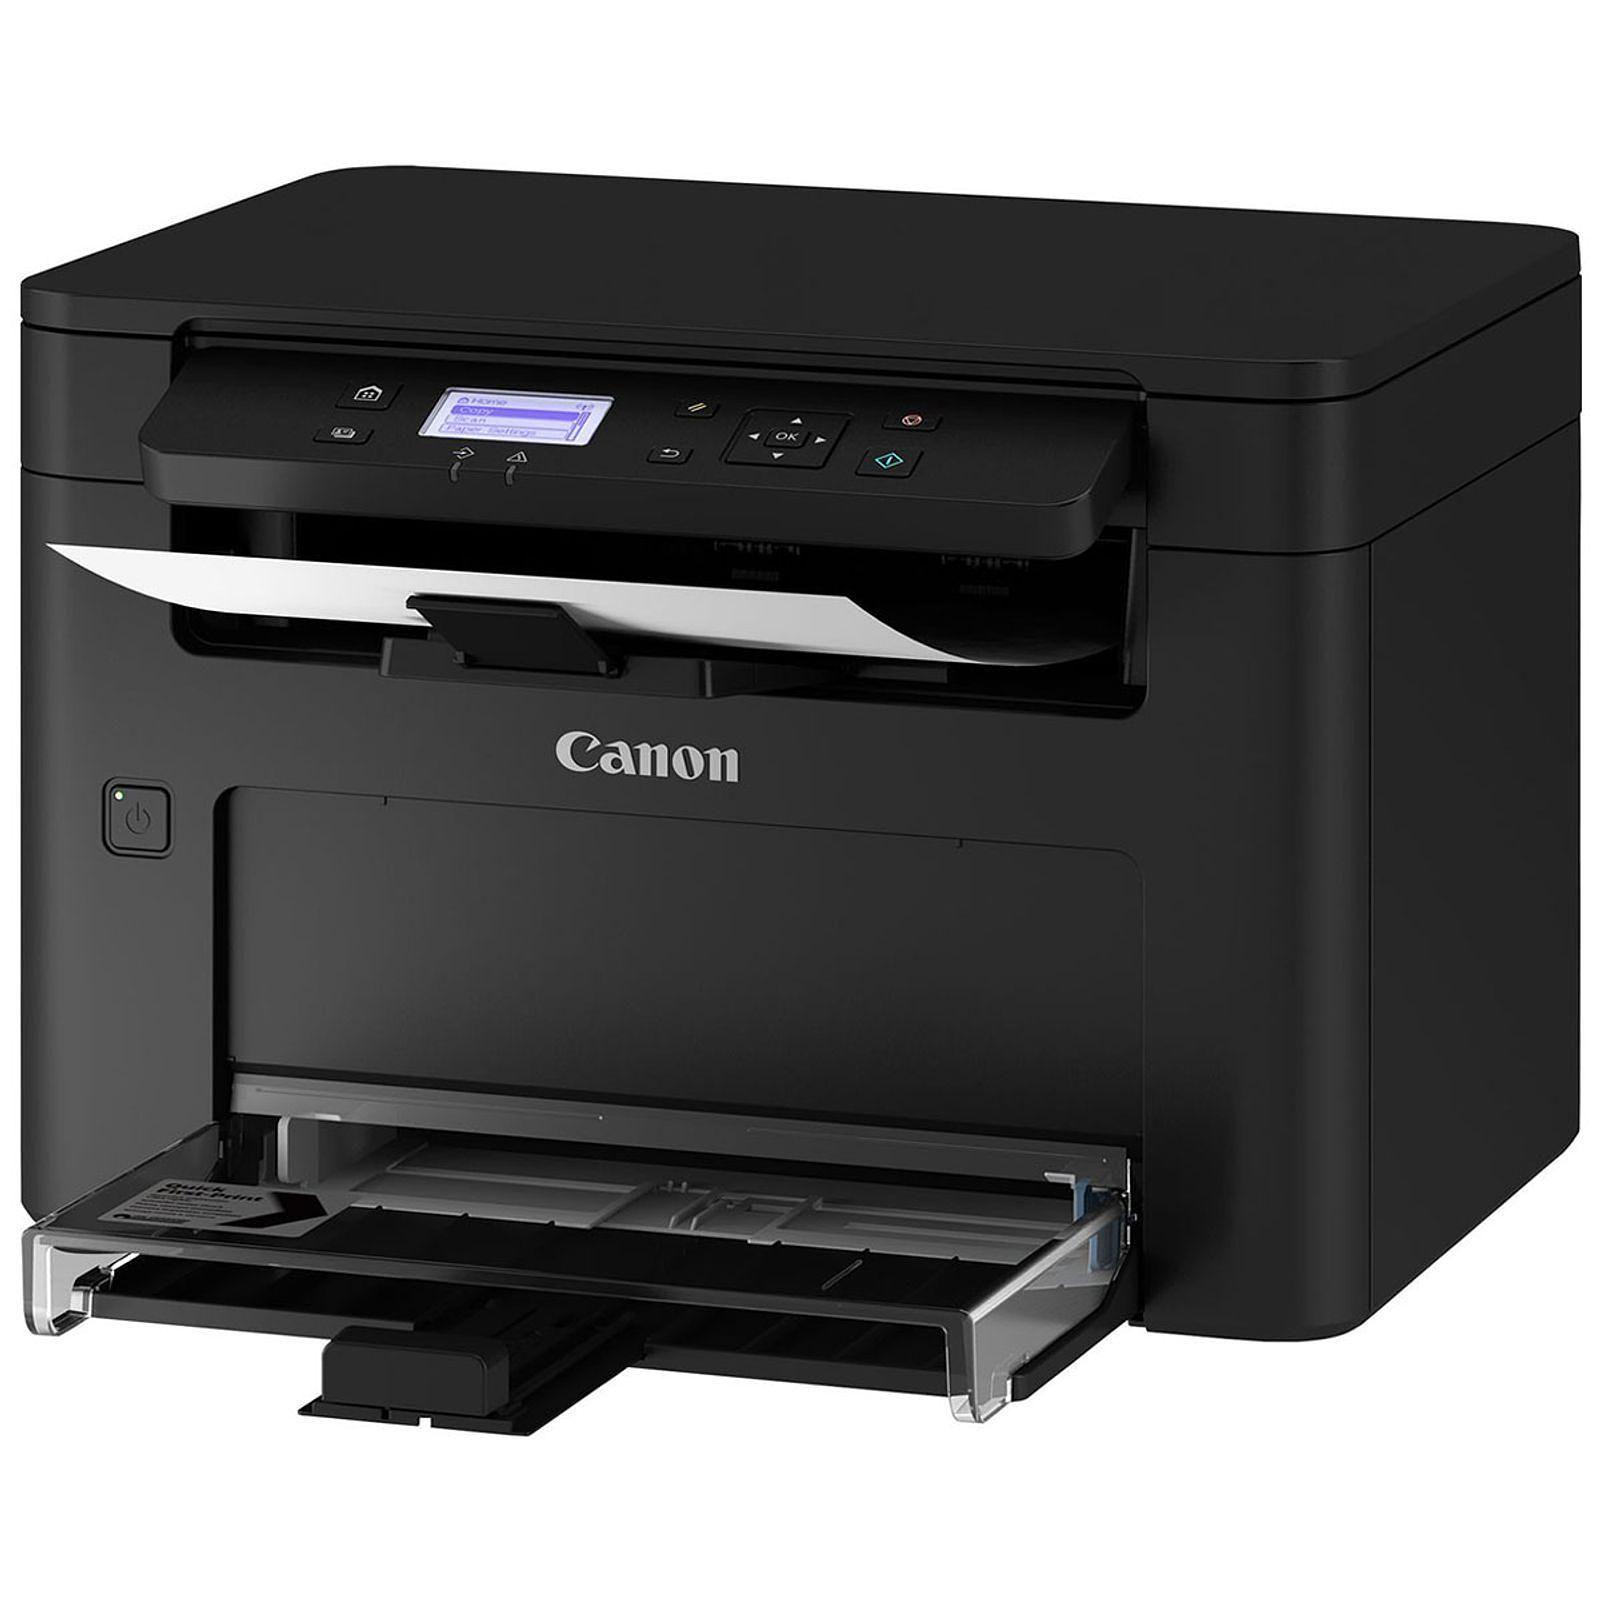 Imprimante multifonction Canon i-SENSYS MF112 - Cybertek.fr - 2